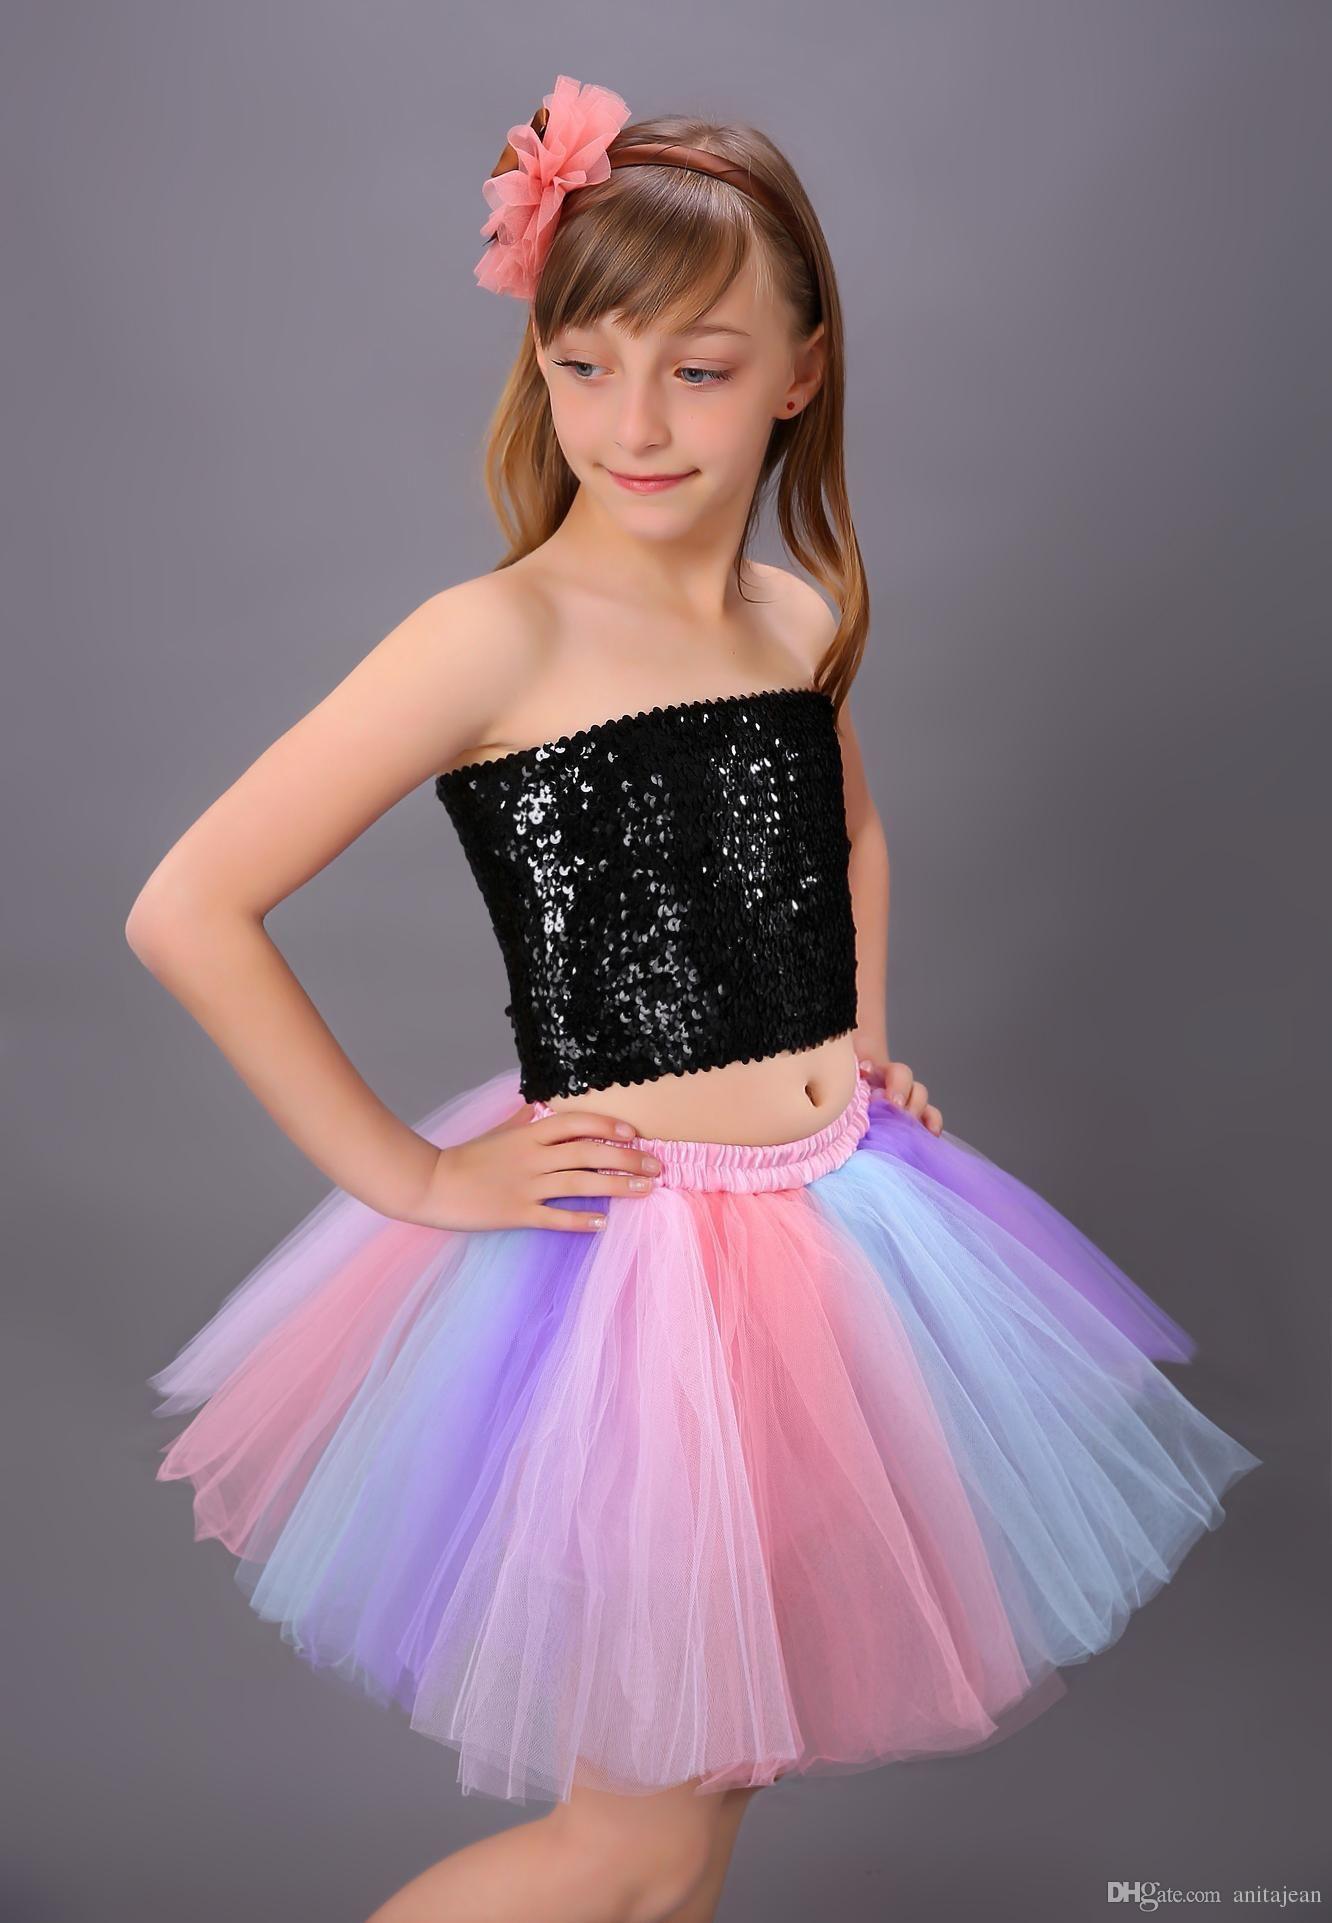 2019 Quality Girls Layered Tulle Princess Tutu Skirts